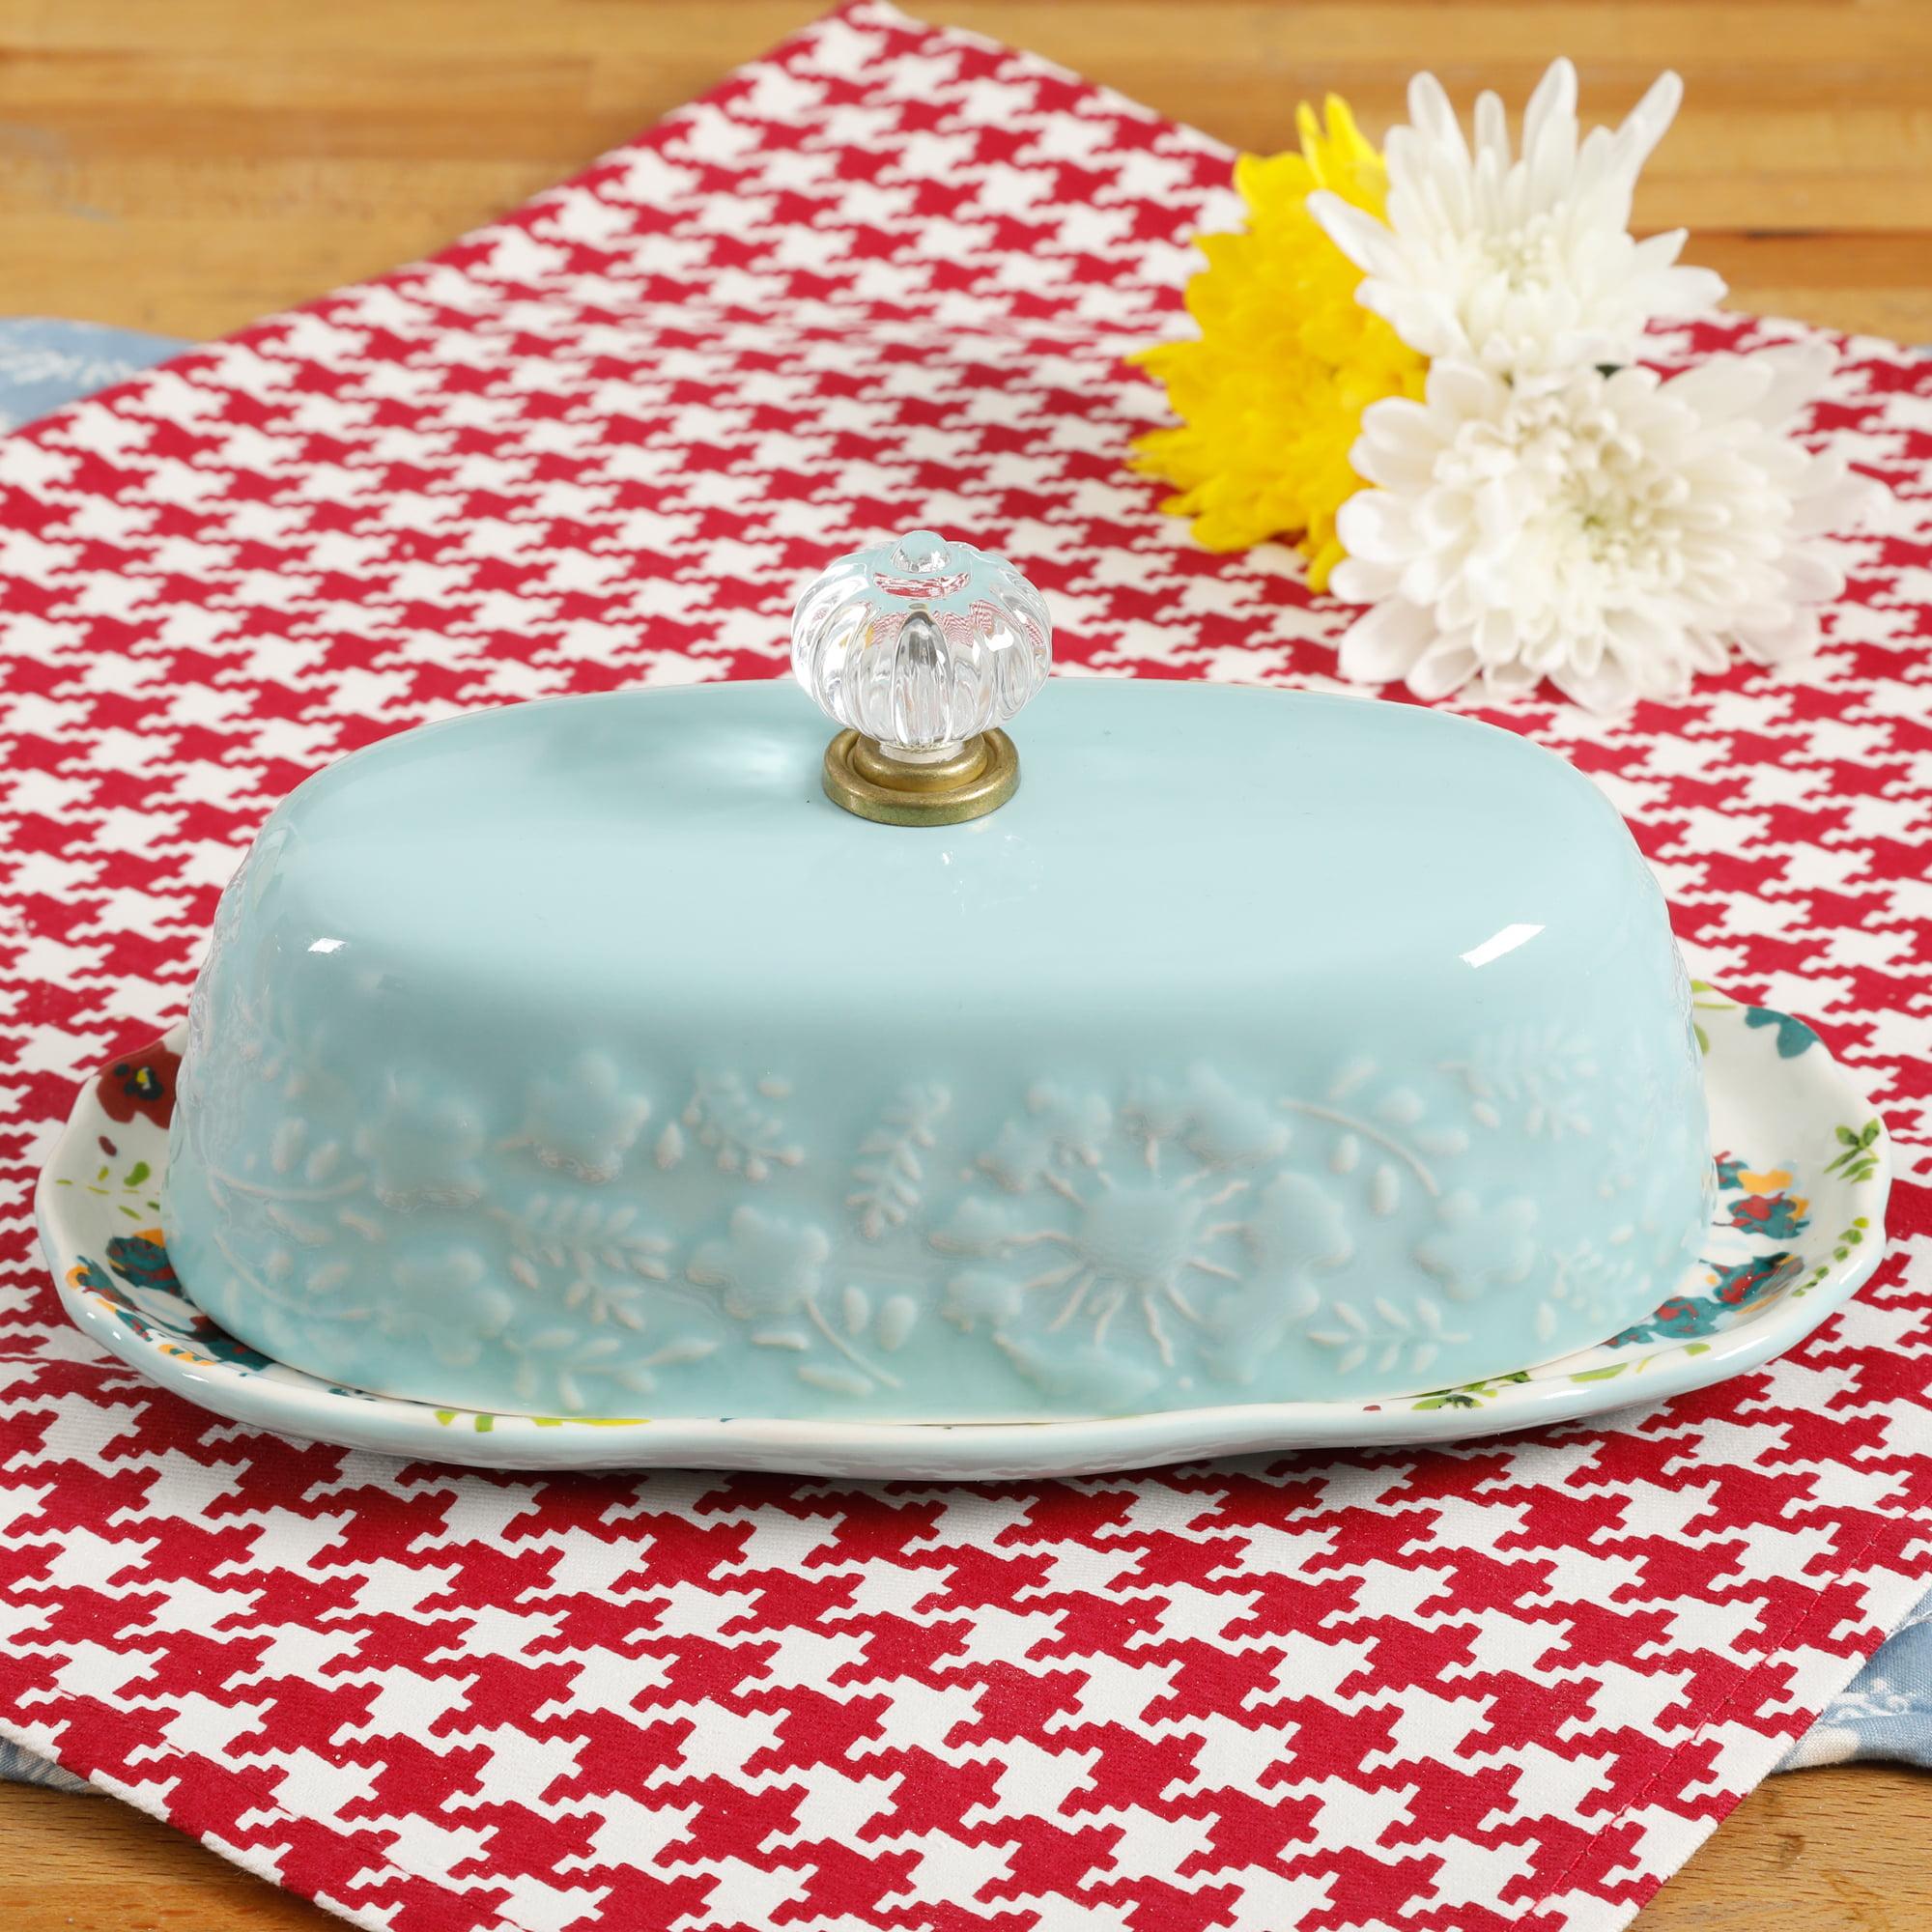 The blue cake company wedding cakes birthday cakes 2016 car release - The Blue Cake Company Wedding Cakes Birthday Cakes 2016 Car Release 36